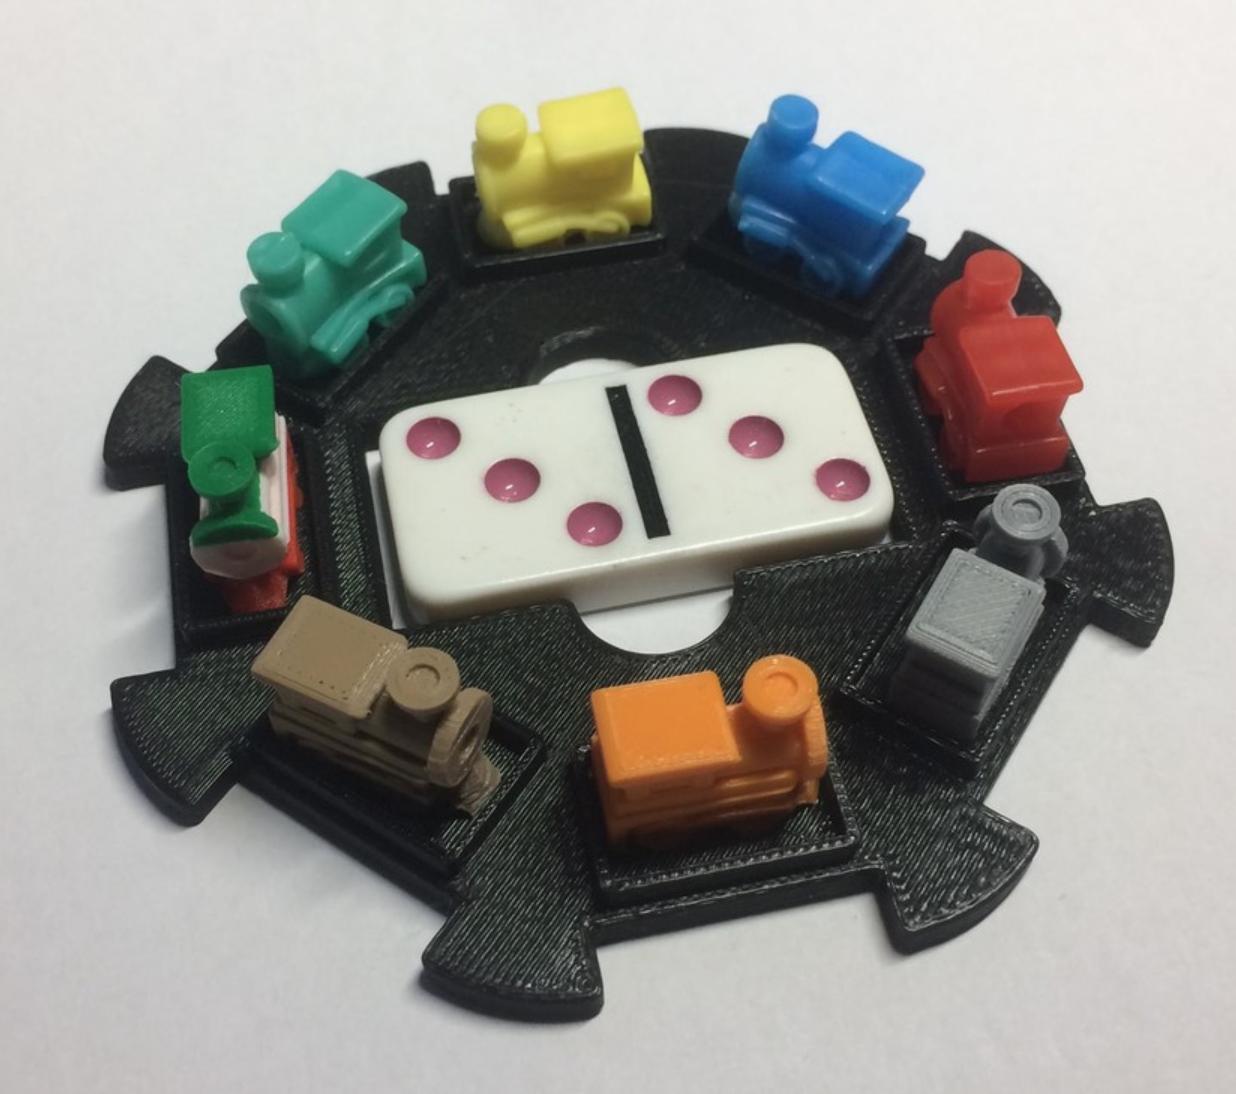 Capture d'écran 2018-01-02 à 12.10.06.png Download free STL file Mexican Train Domino Hub • 3D printer object, sthone